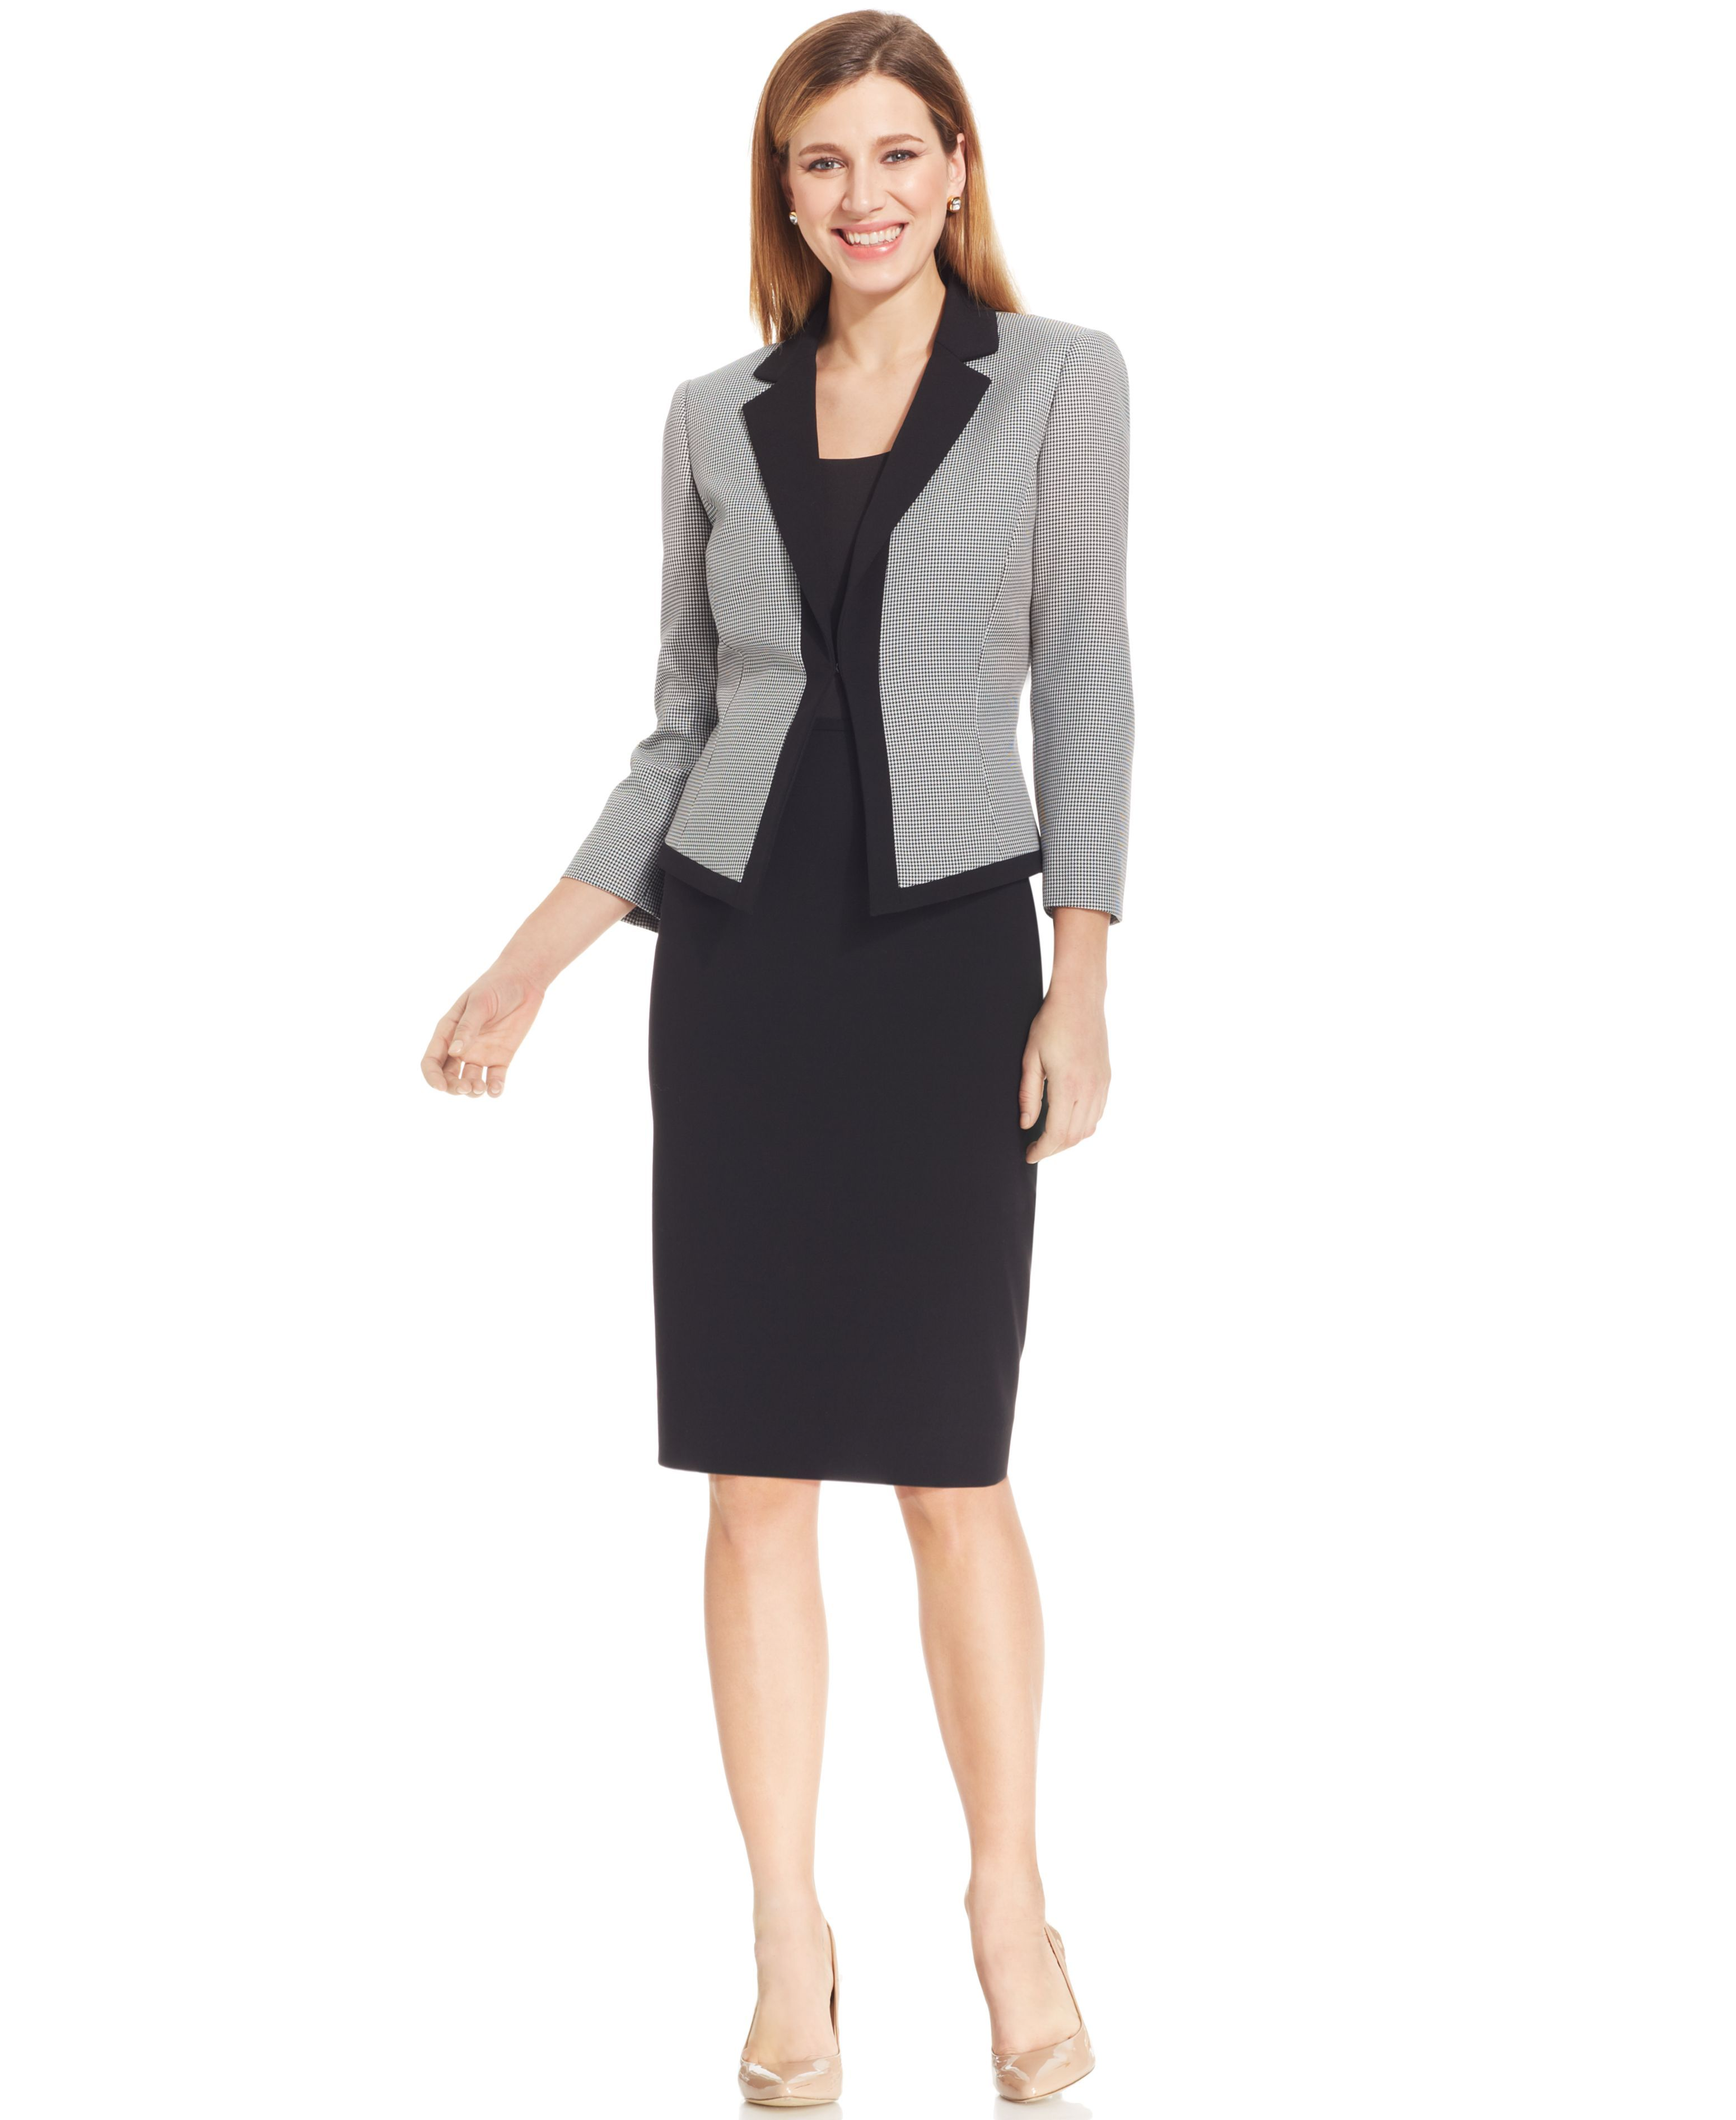 46c35c176e8a MACYS ---- Tahari ASL Houndstooth-Jacket Skirt Suit ---- 2659493_fpx ----  Nane Feist ----